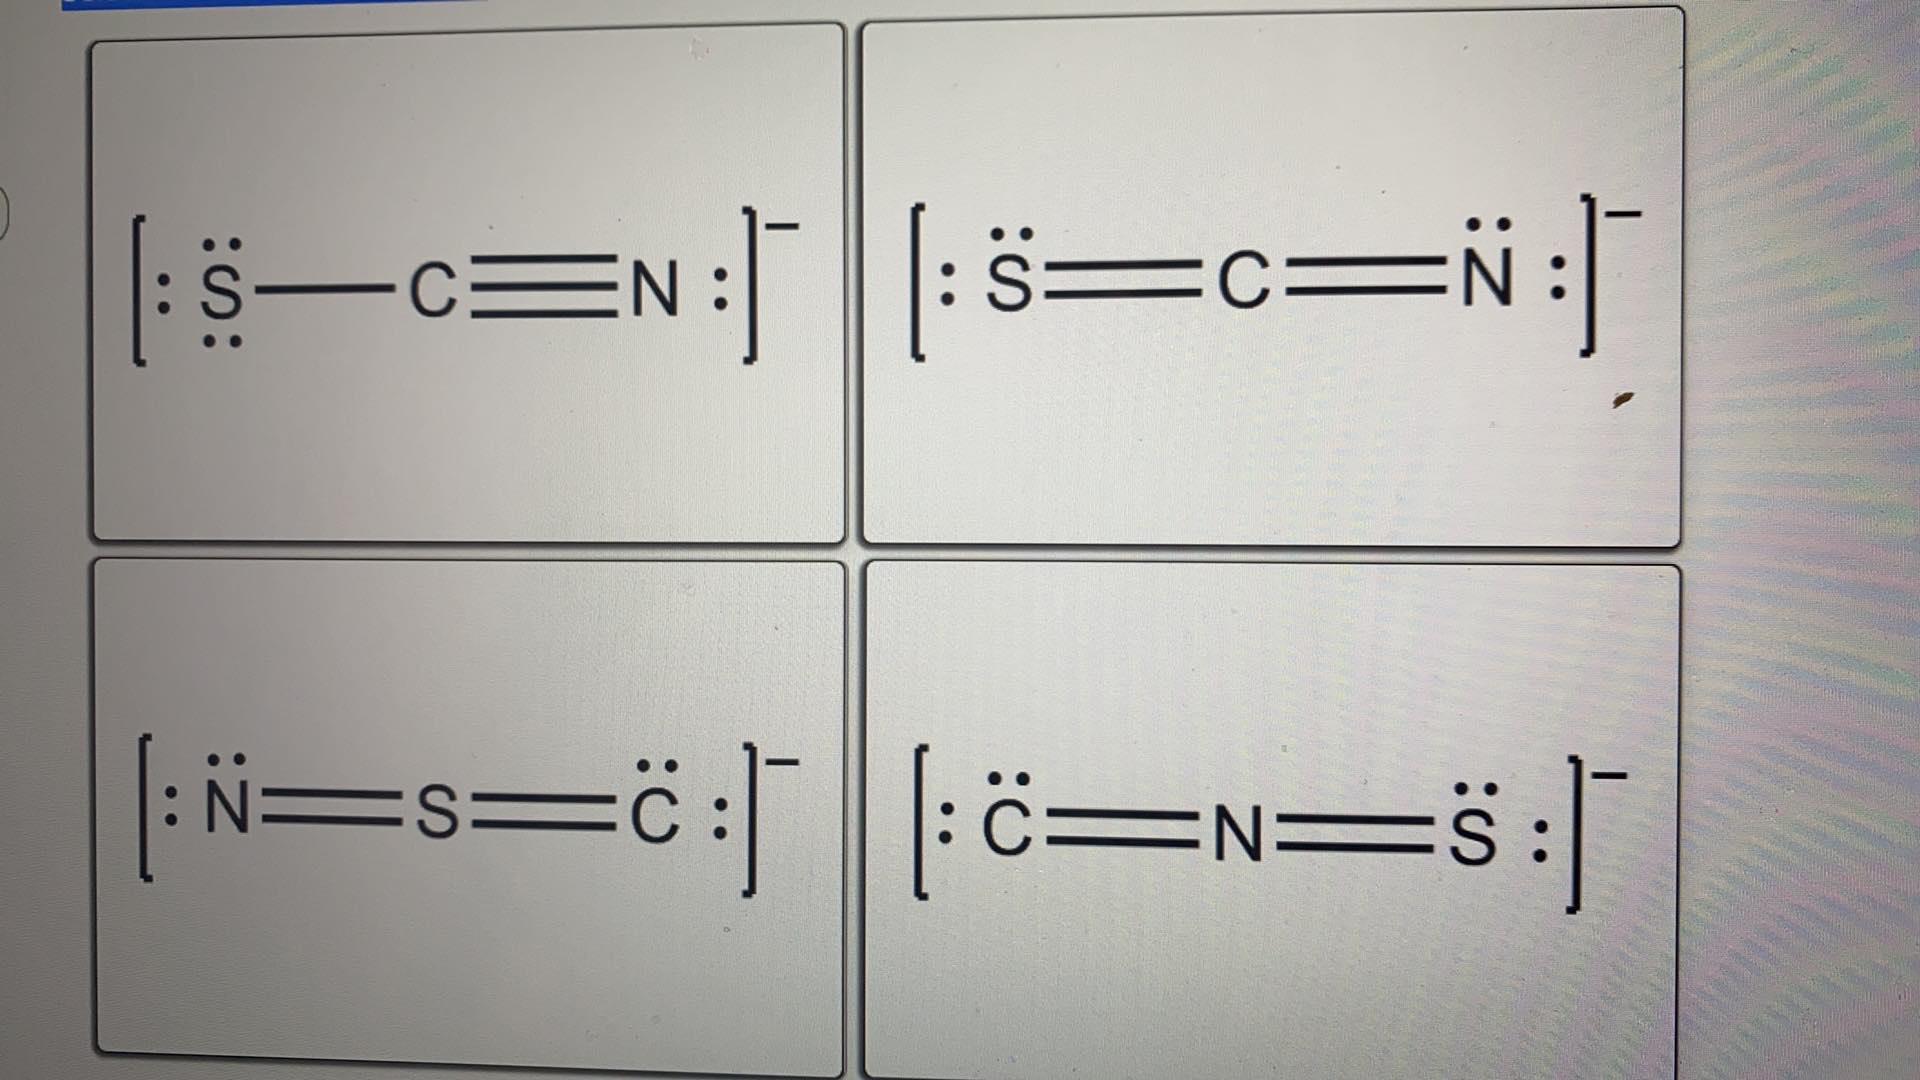 -c=N:: s=c=ï:| s=c=N: N=s=ö: |:ö=N=ö:| :ċ=N=s